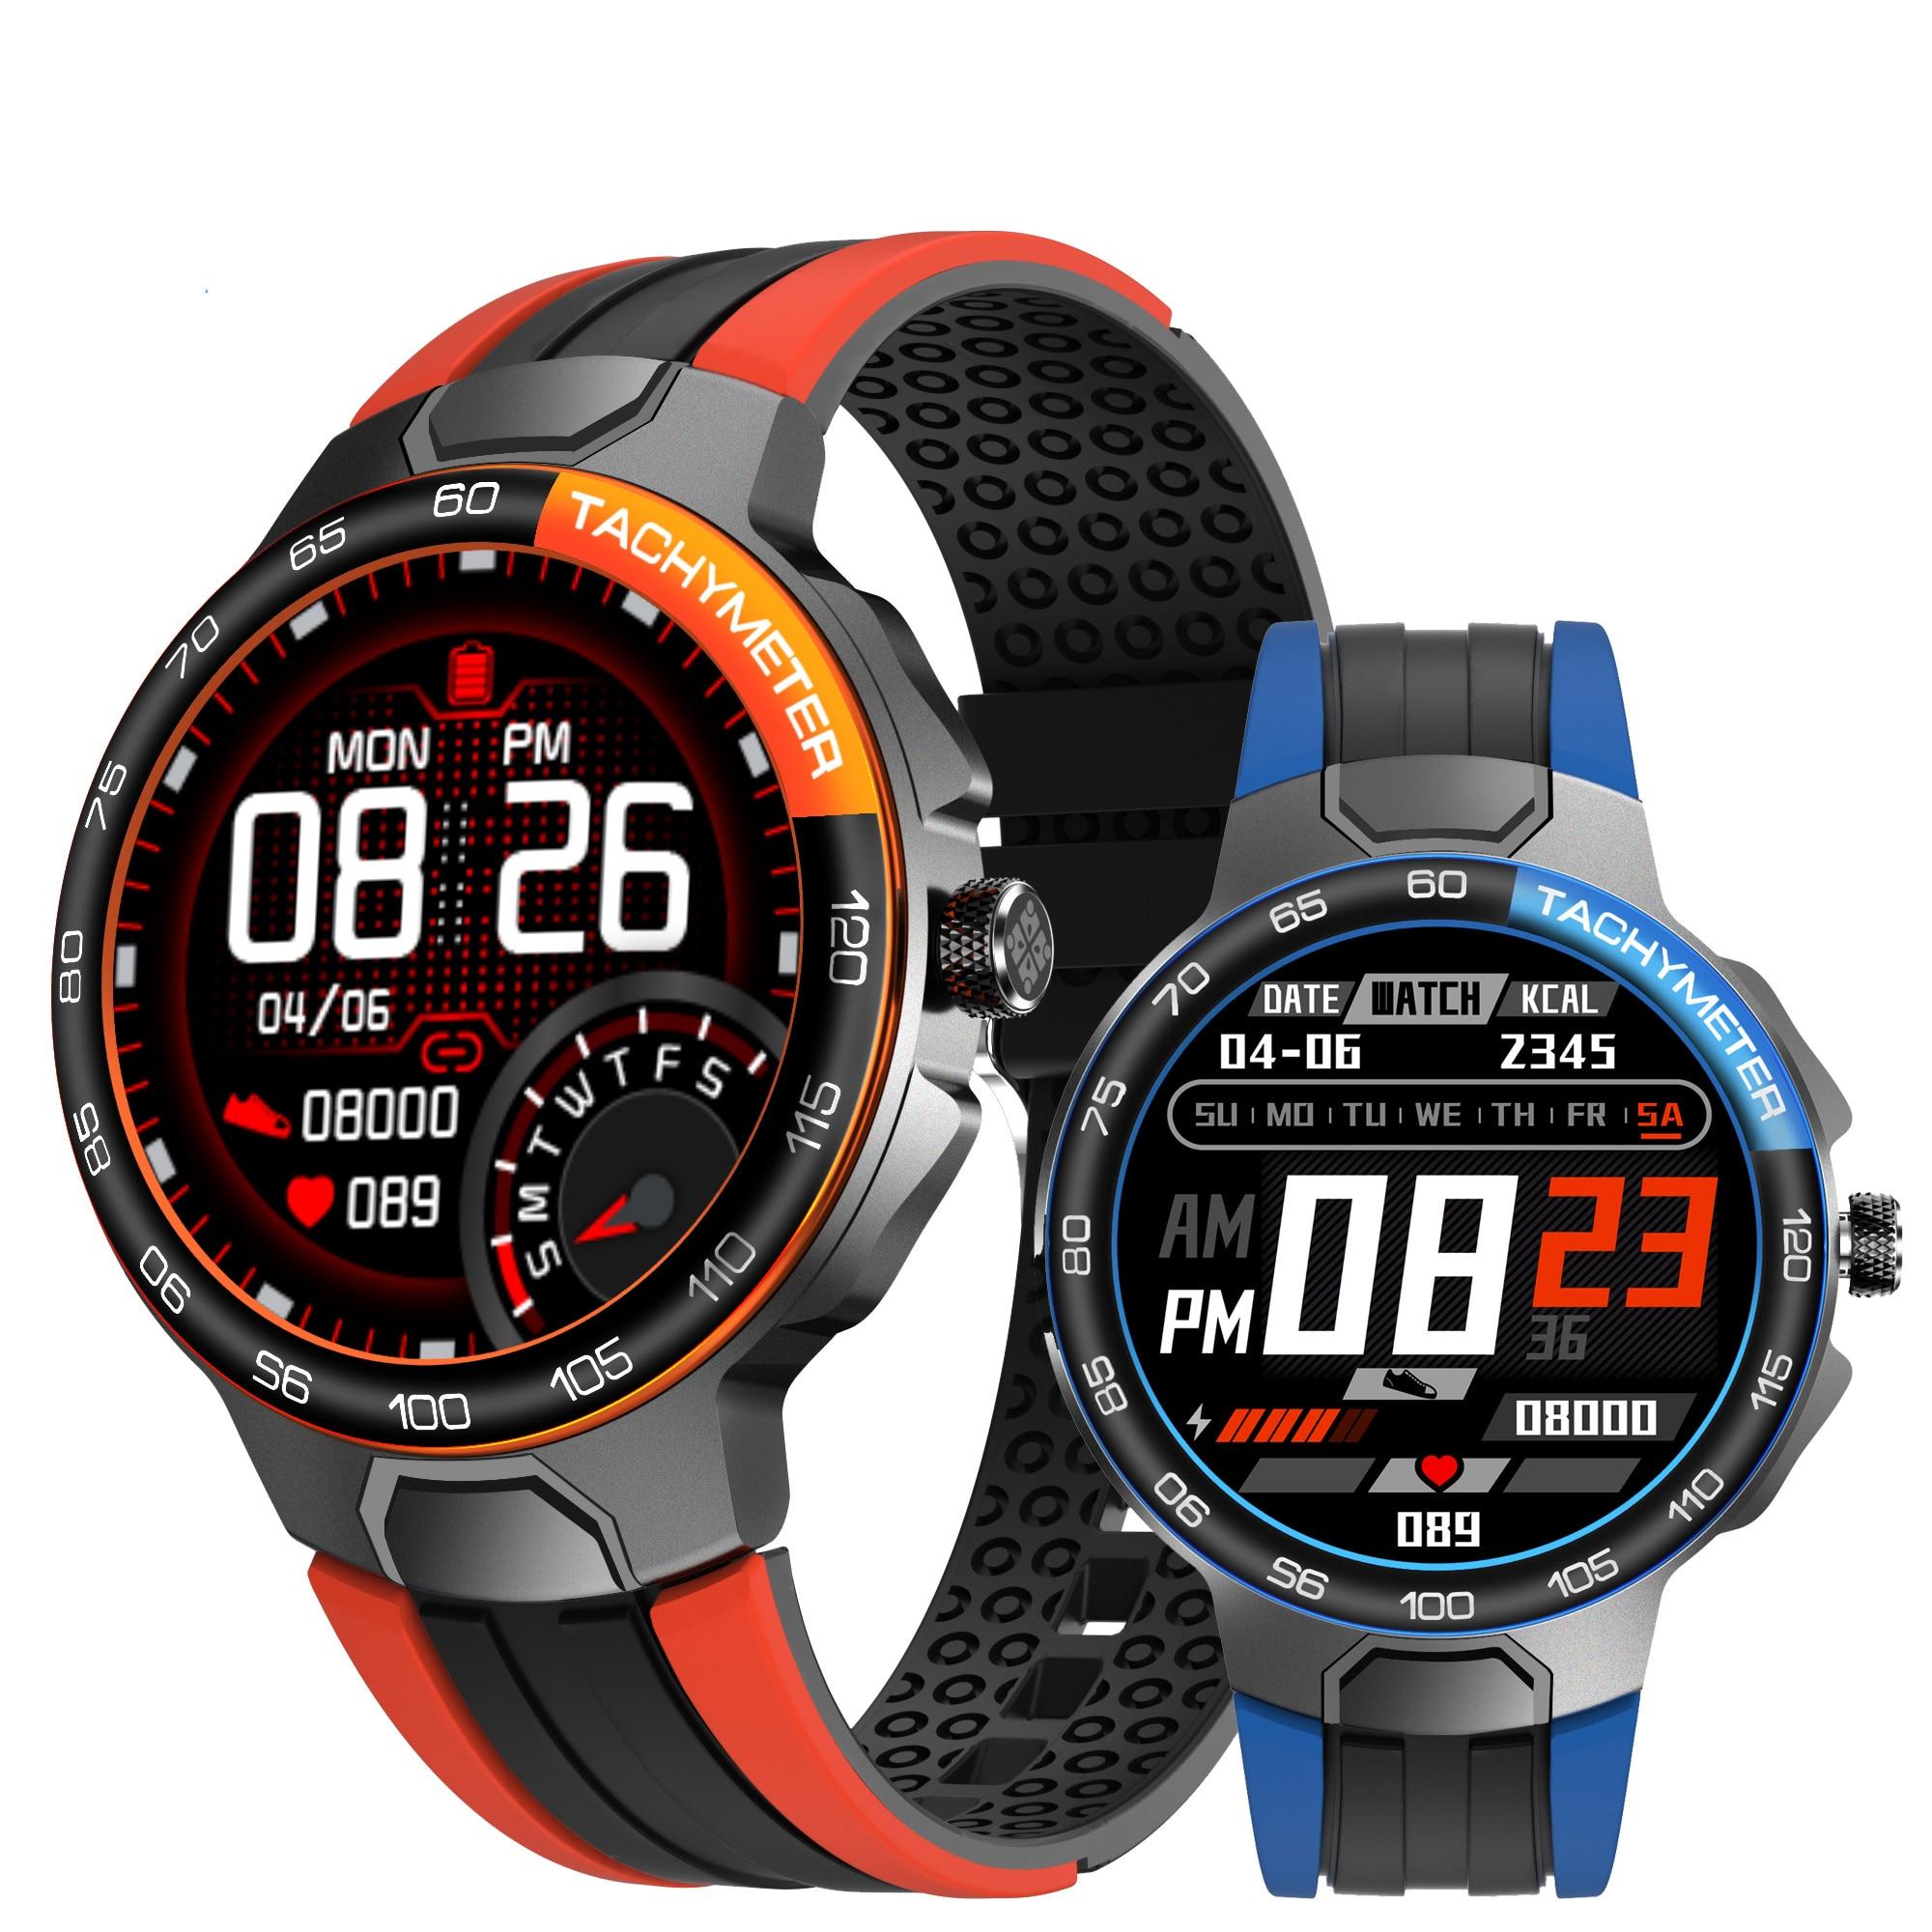 E15 Smart Watch Men Heart Rate Blood Pressure IP68 Waterproof Weather Sports GPS Track Fitness Motion Smartwatch PK P8 L5 L8 E13